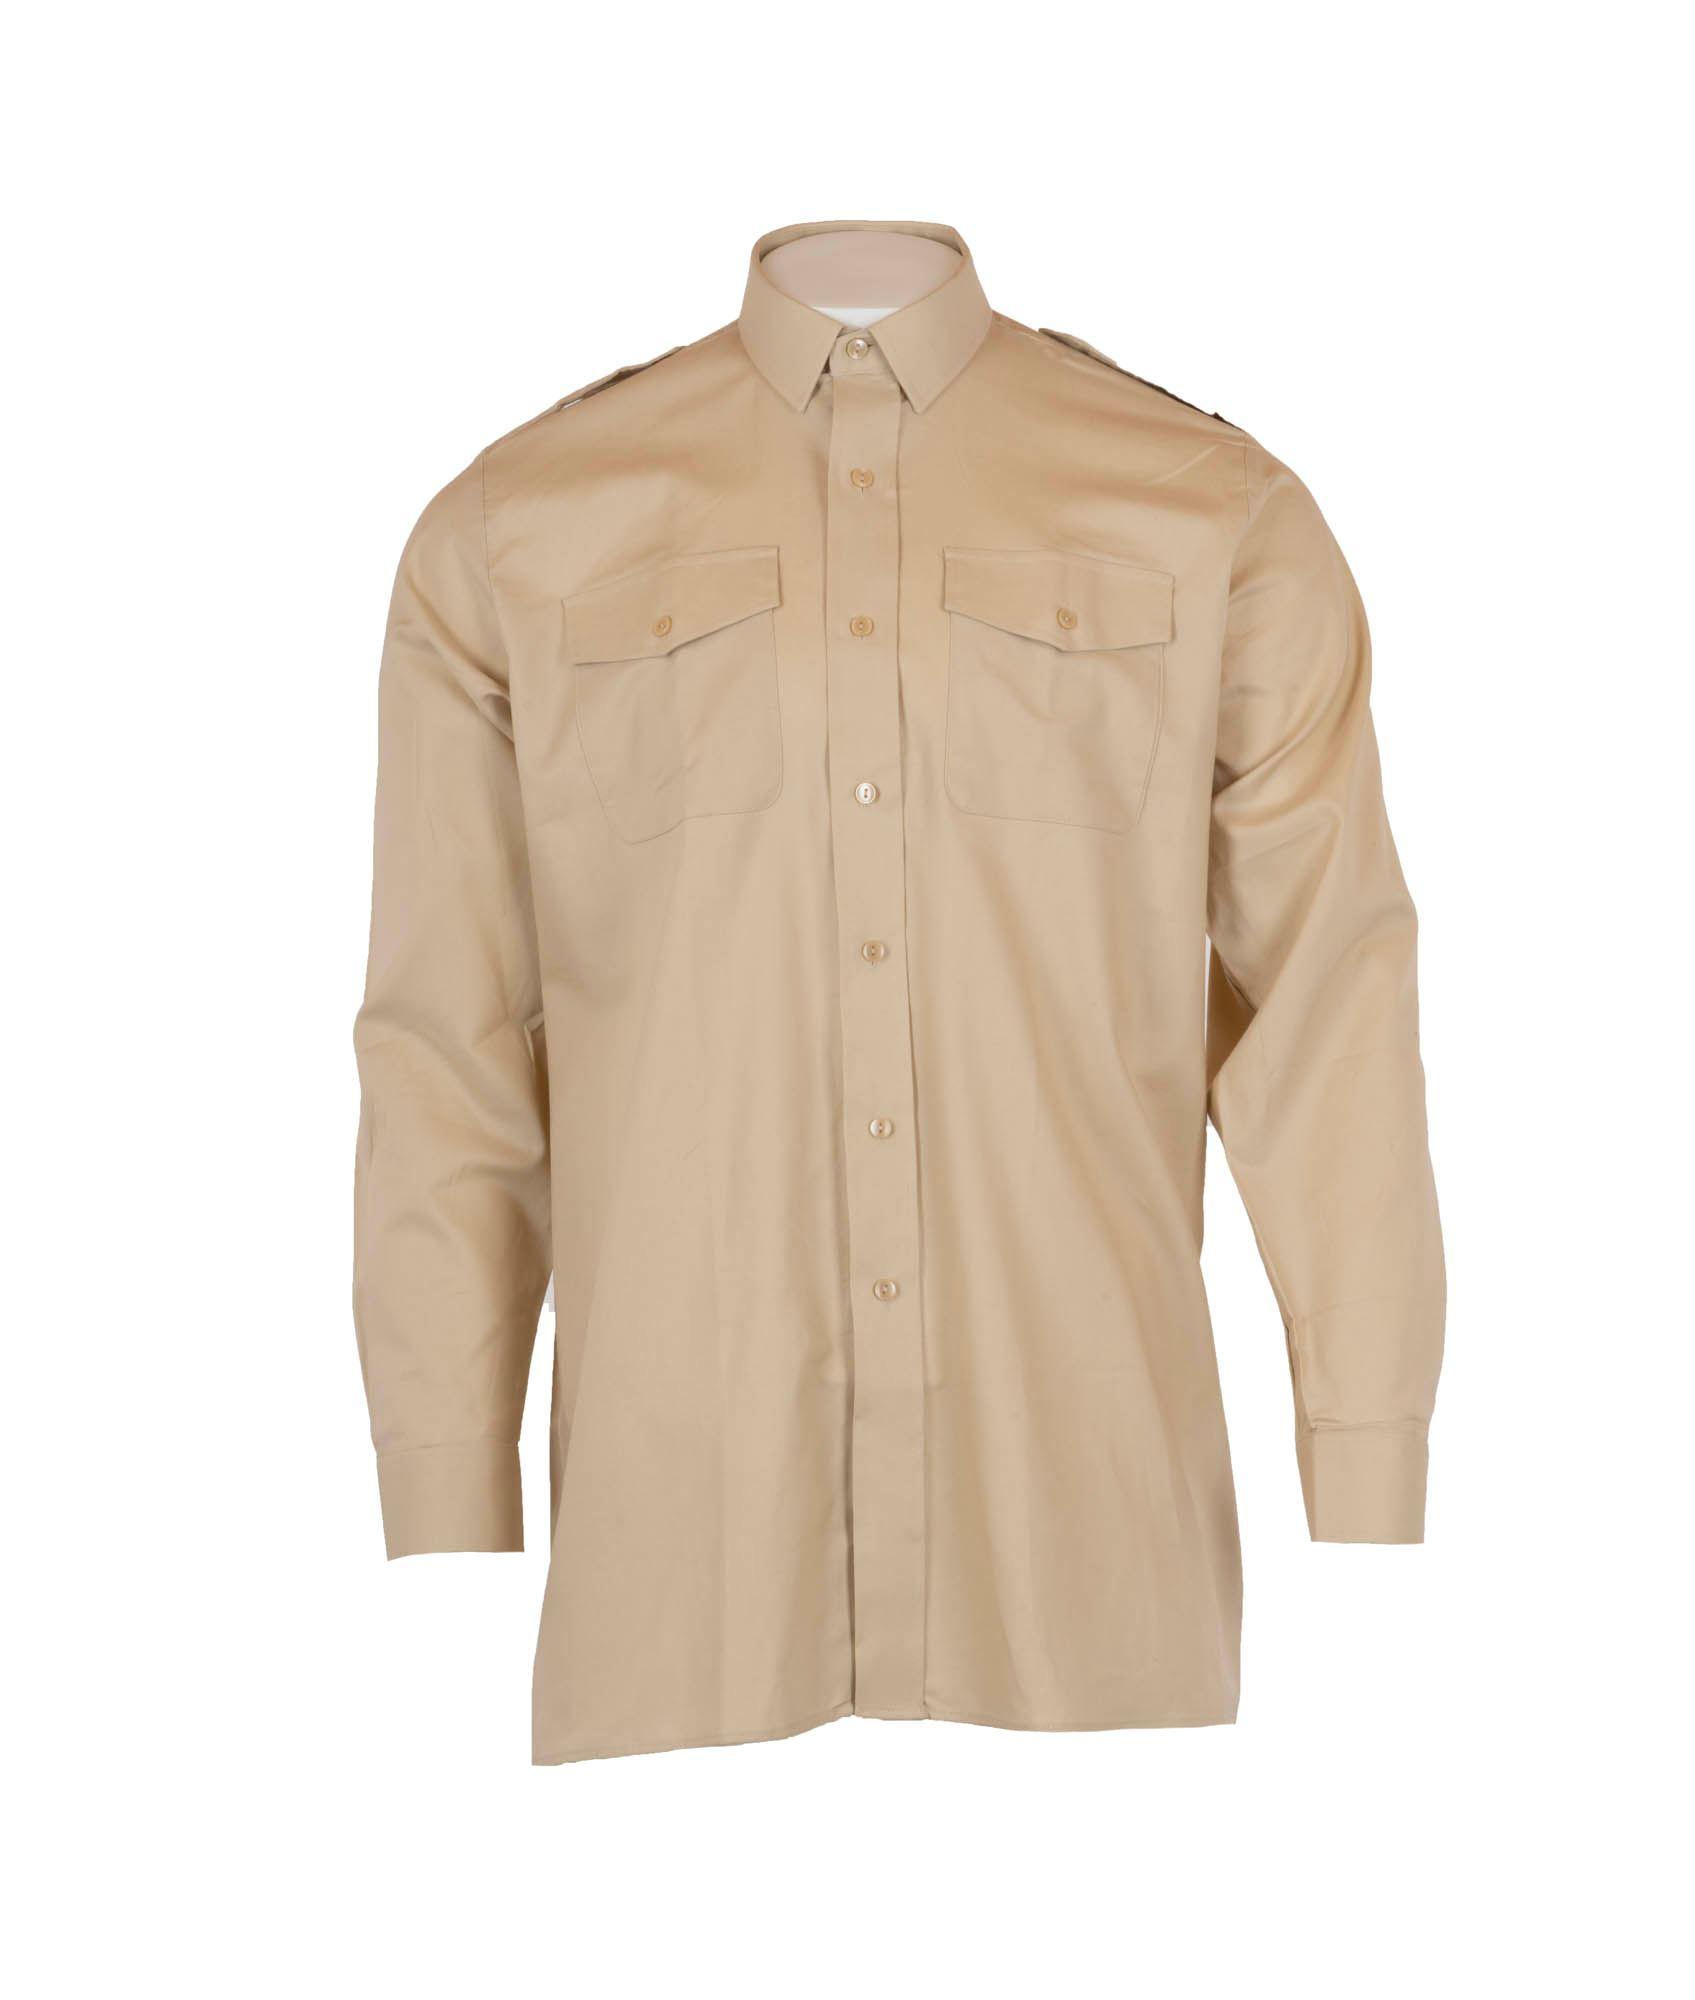 f6da7f56 Køb khakifarvet skjorte med lange ærmer hos 417.dk